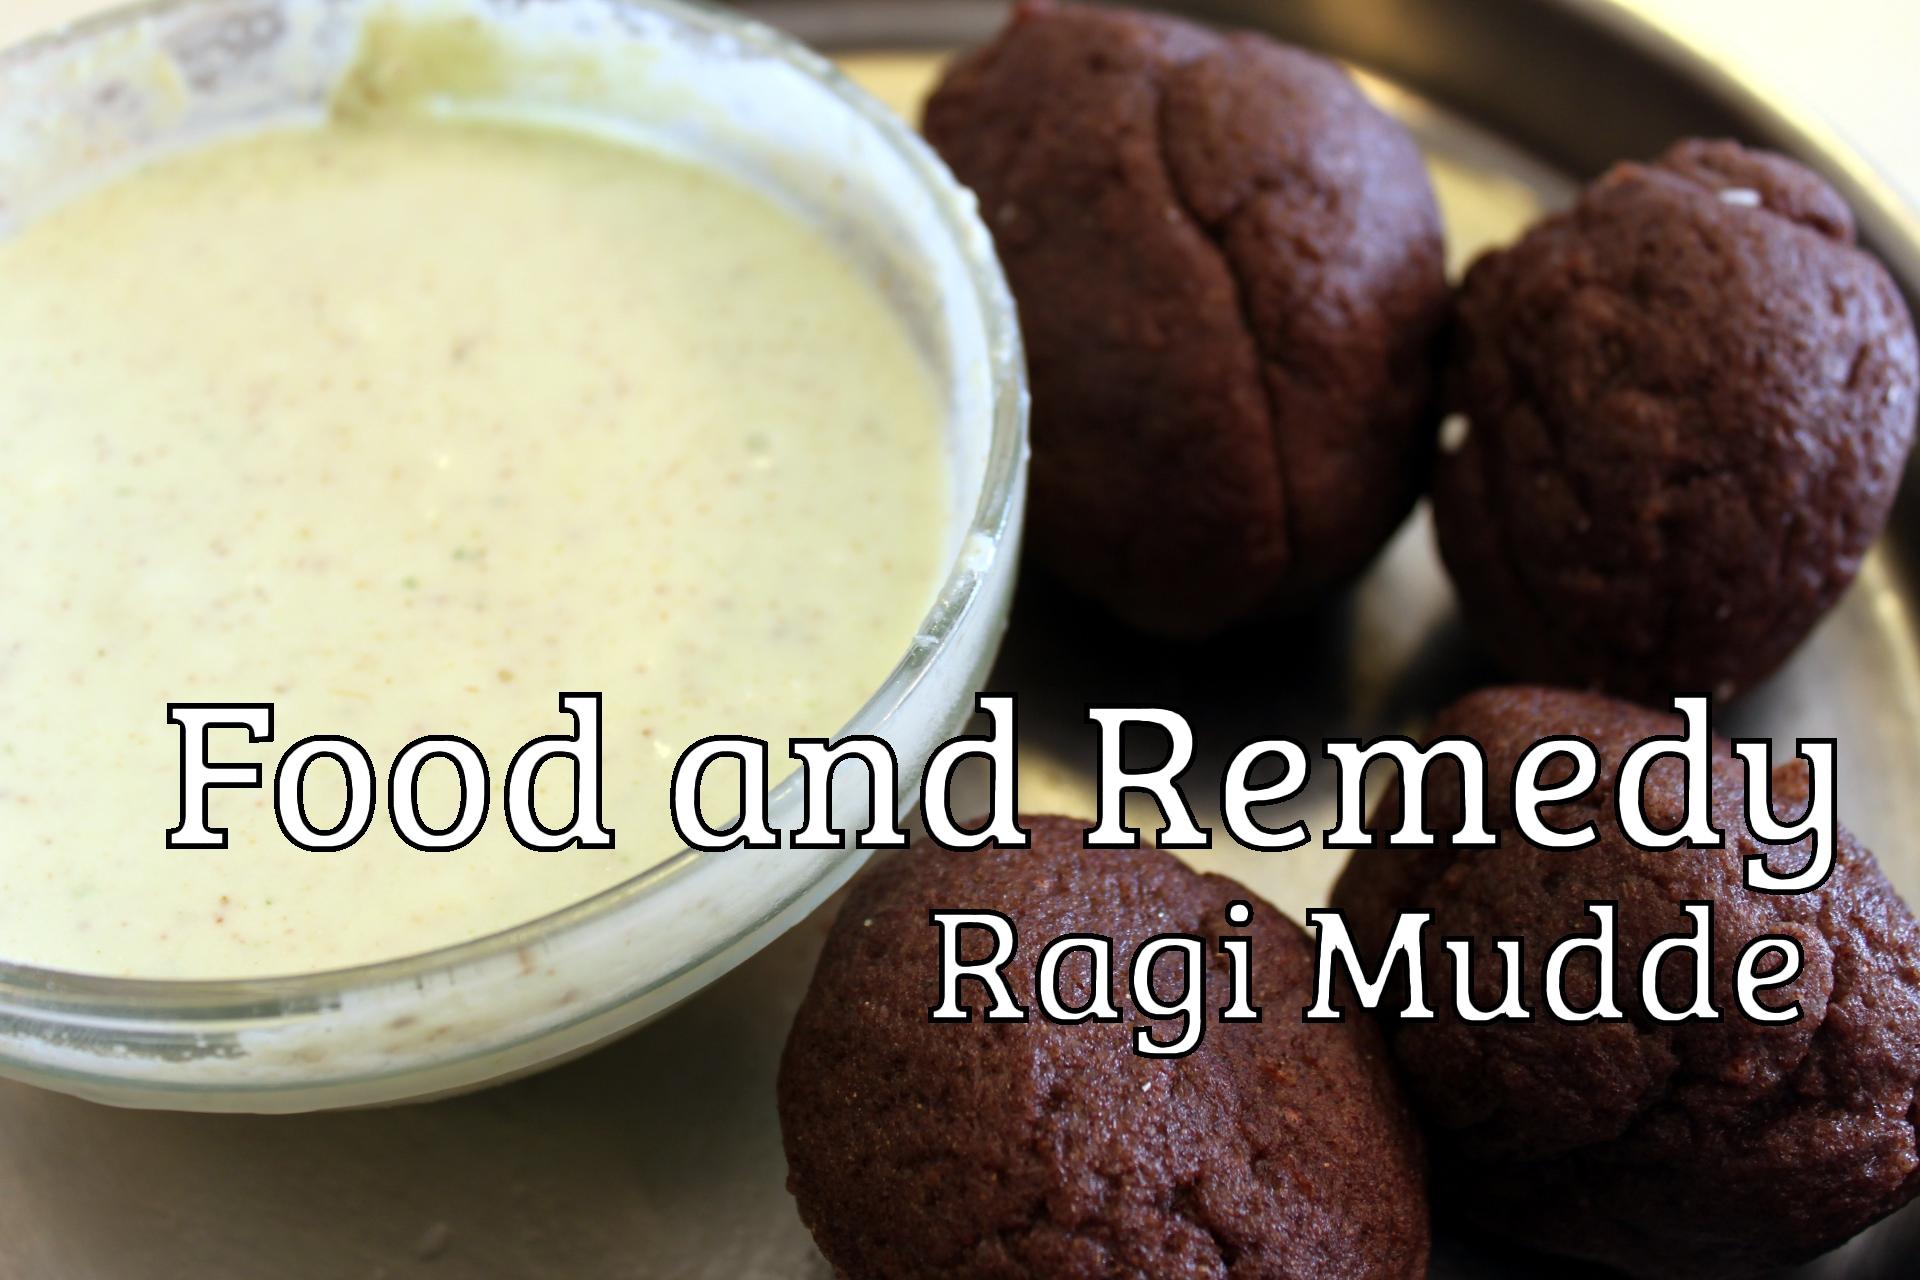 Ragi mudde with side dish finger millet balls food and remedy ragi mudde forumfinder Gallery